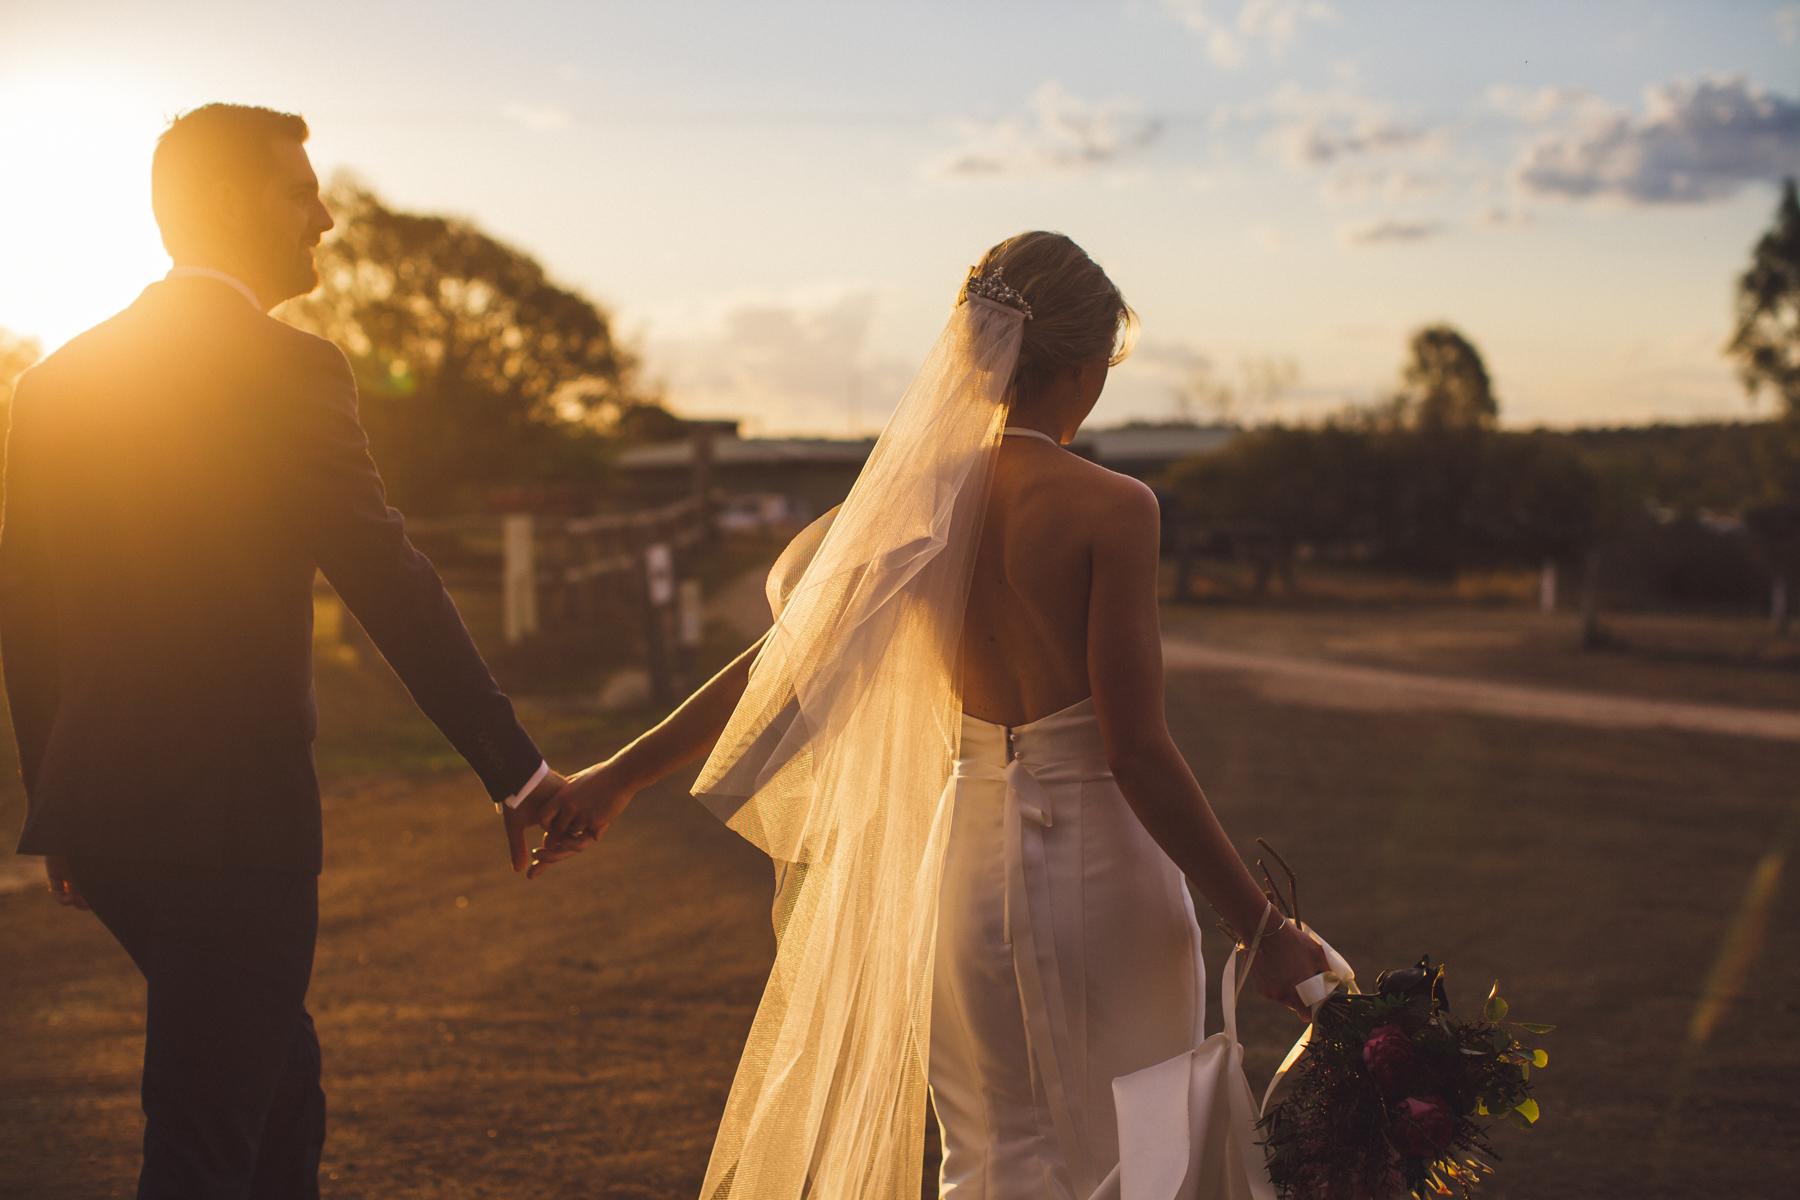 spicers-hiddenvale-wedding-100A.JPG